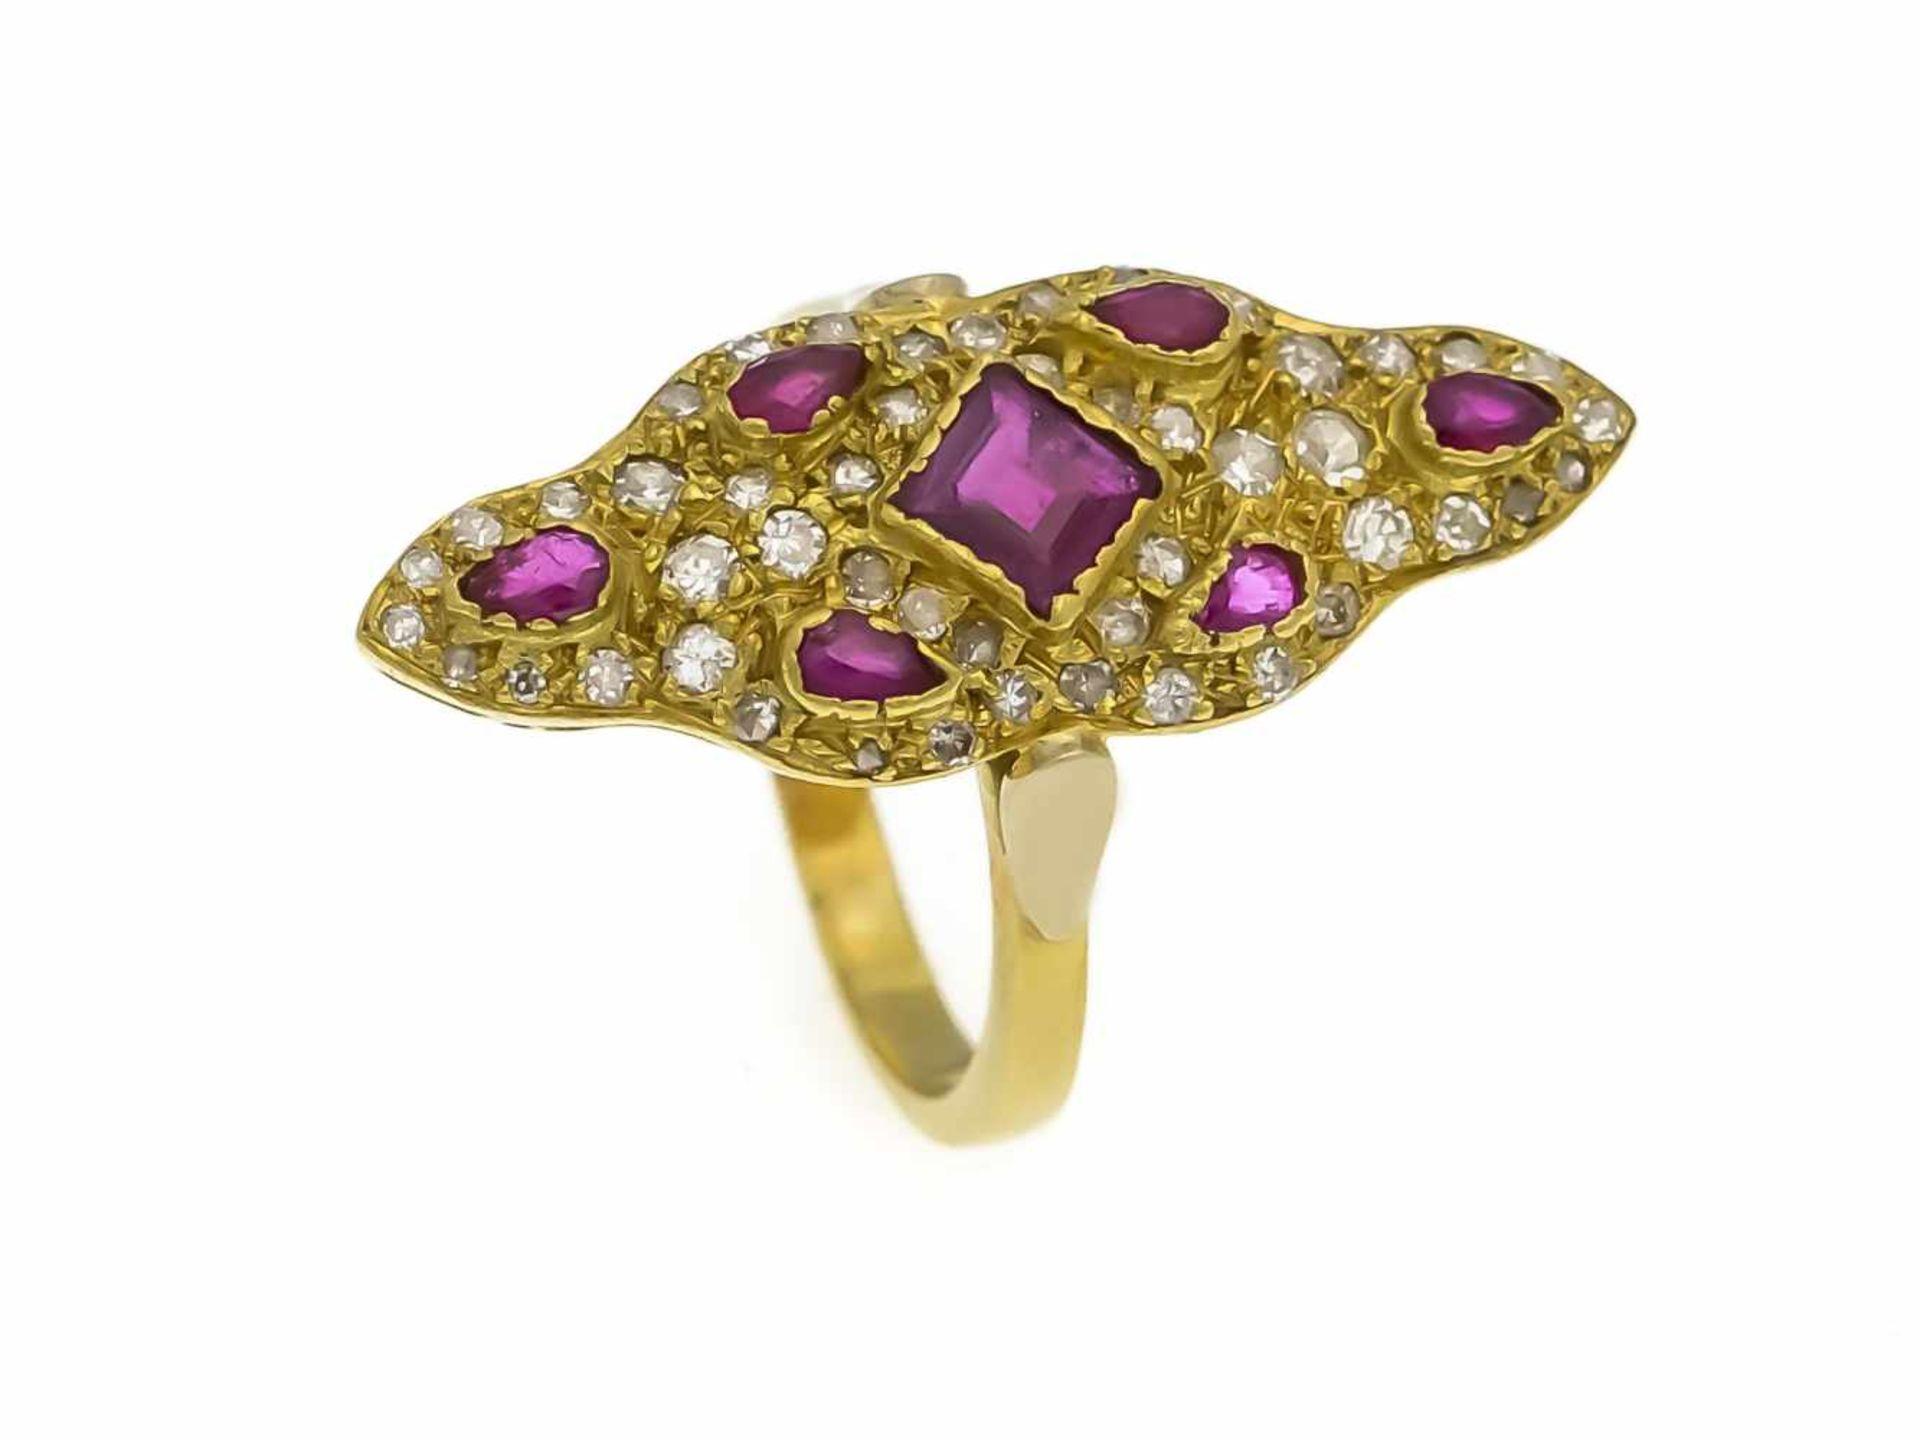 Los 18 - Rubin-Diamant-Ring GG 750/000 mit einem fac. Rubin-Carré 4,5 mm, 6 fac. Rubin-Tropfen 3 mmin...